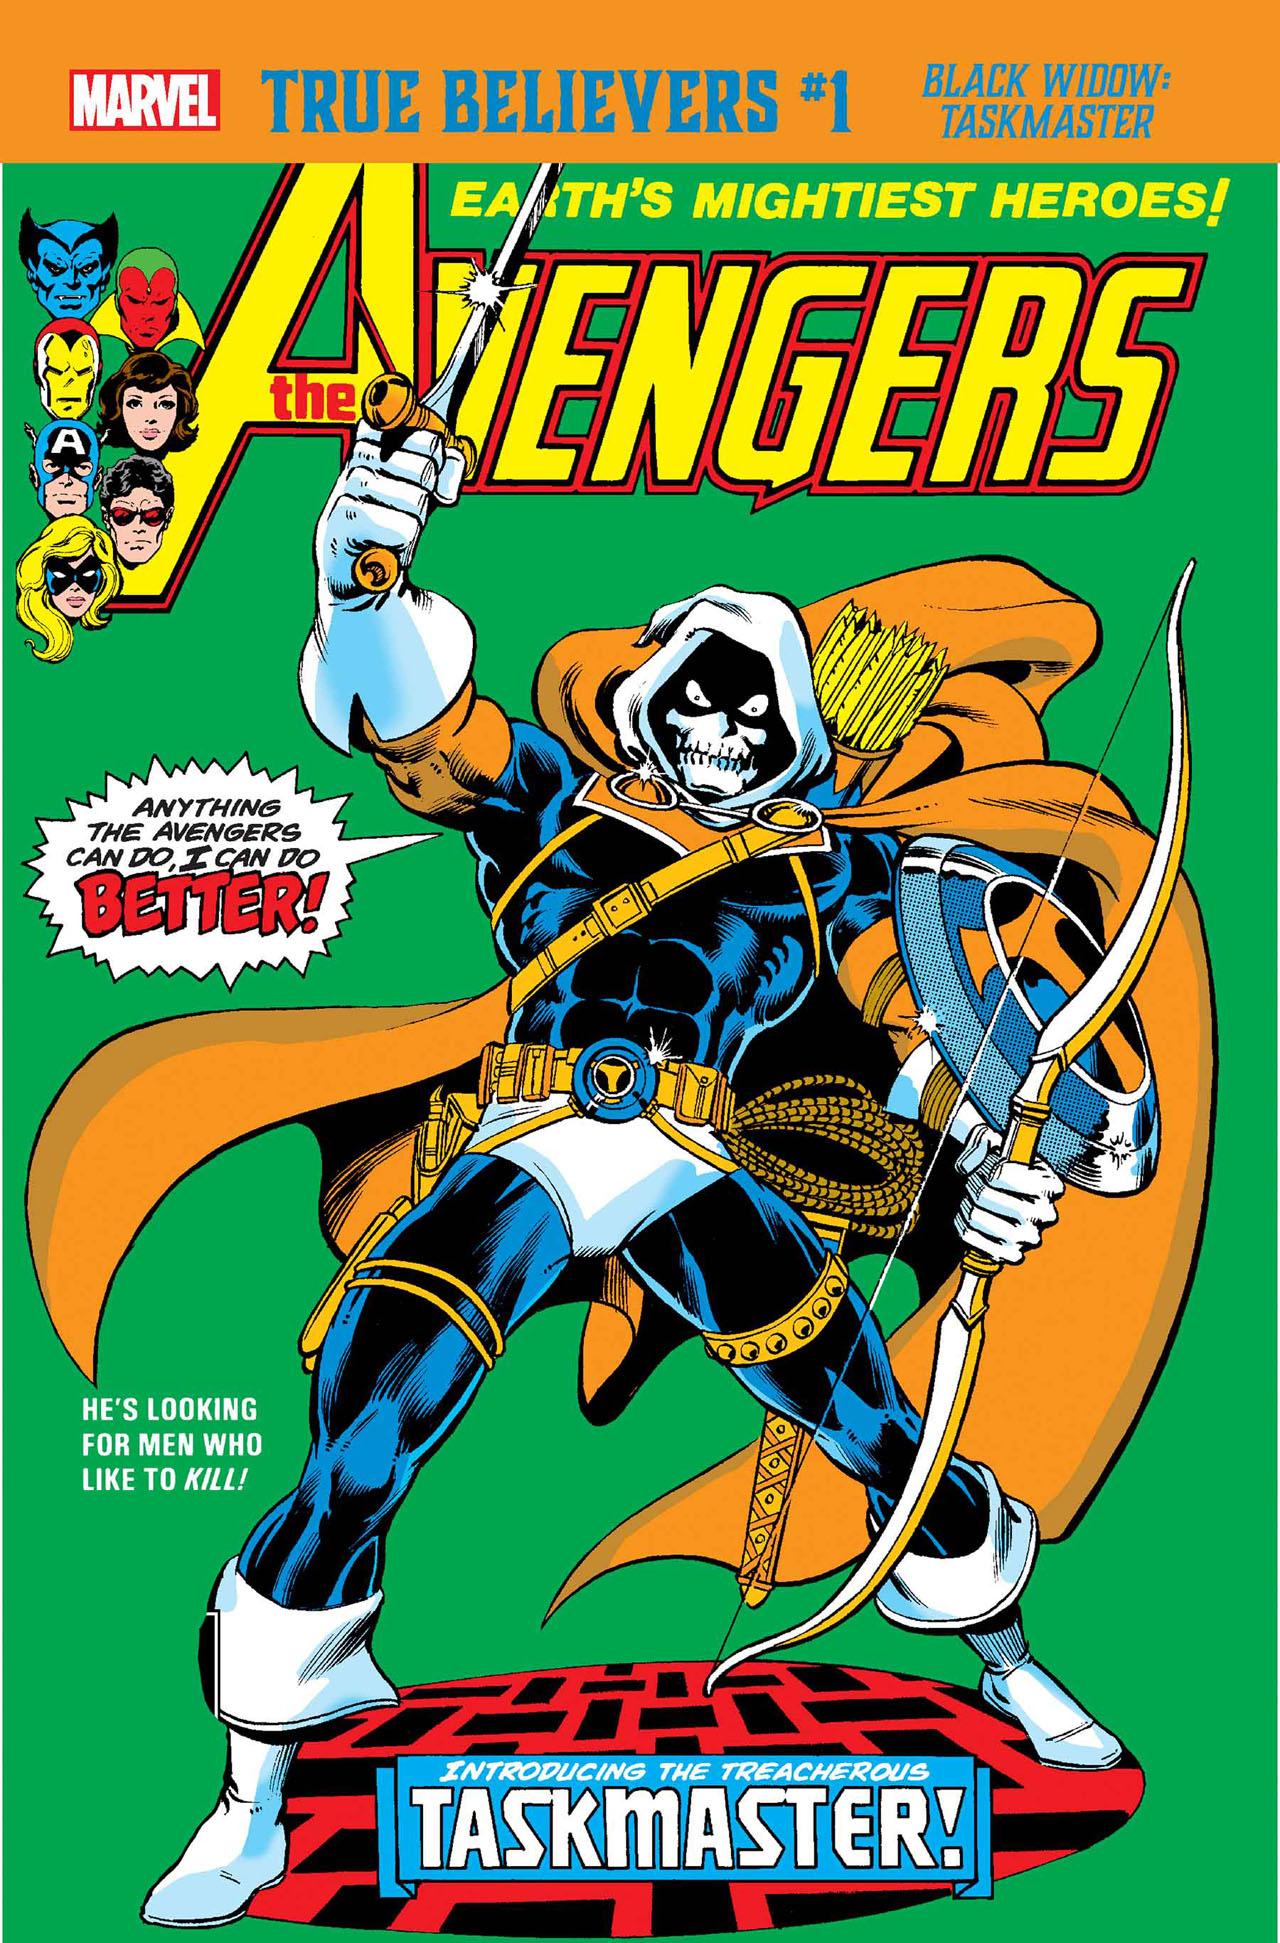 True Believers: Black Widow - Taskmaster Vol 1 1